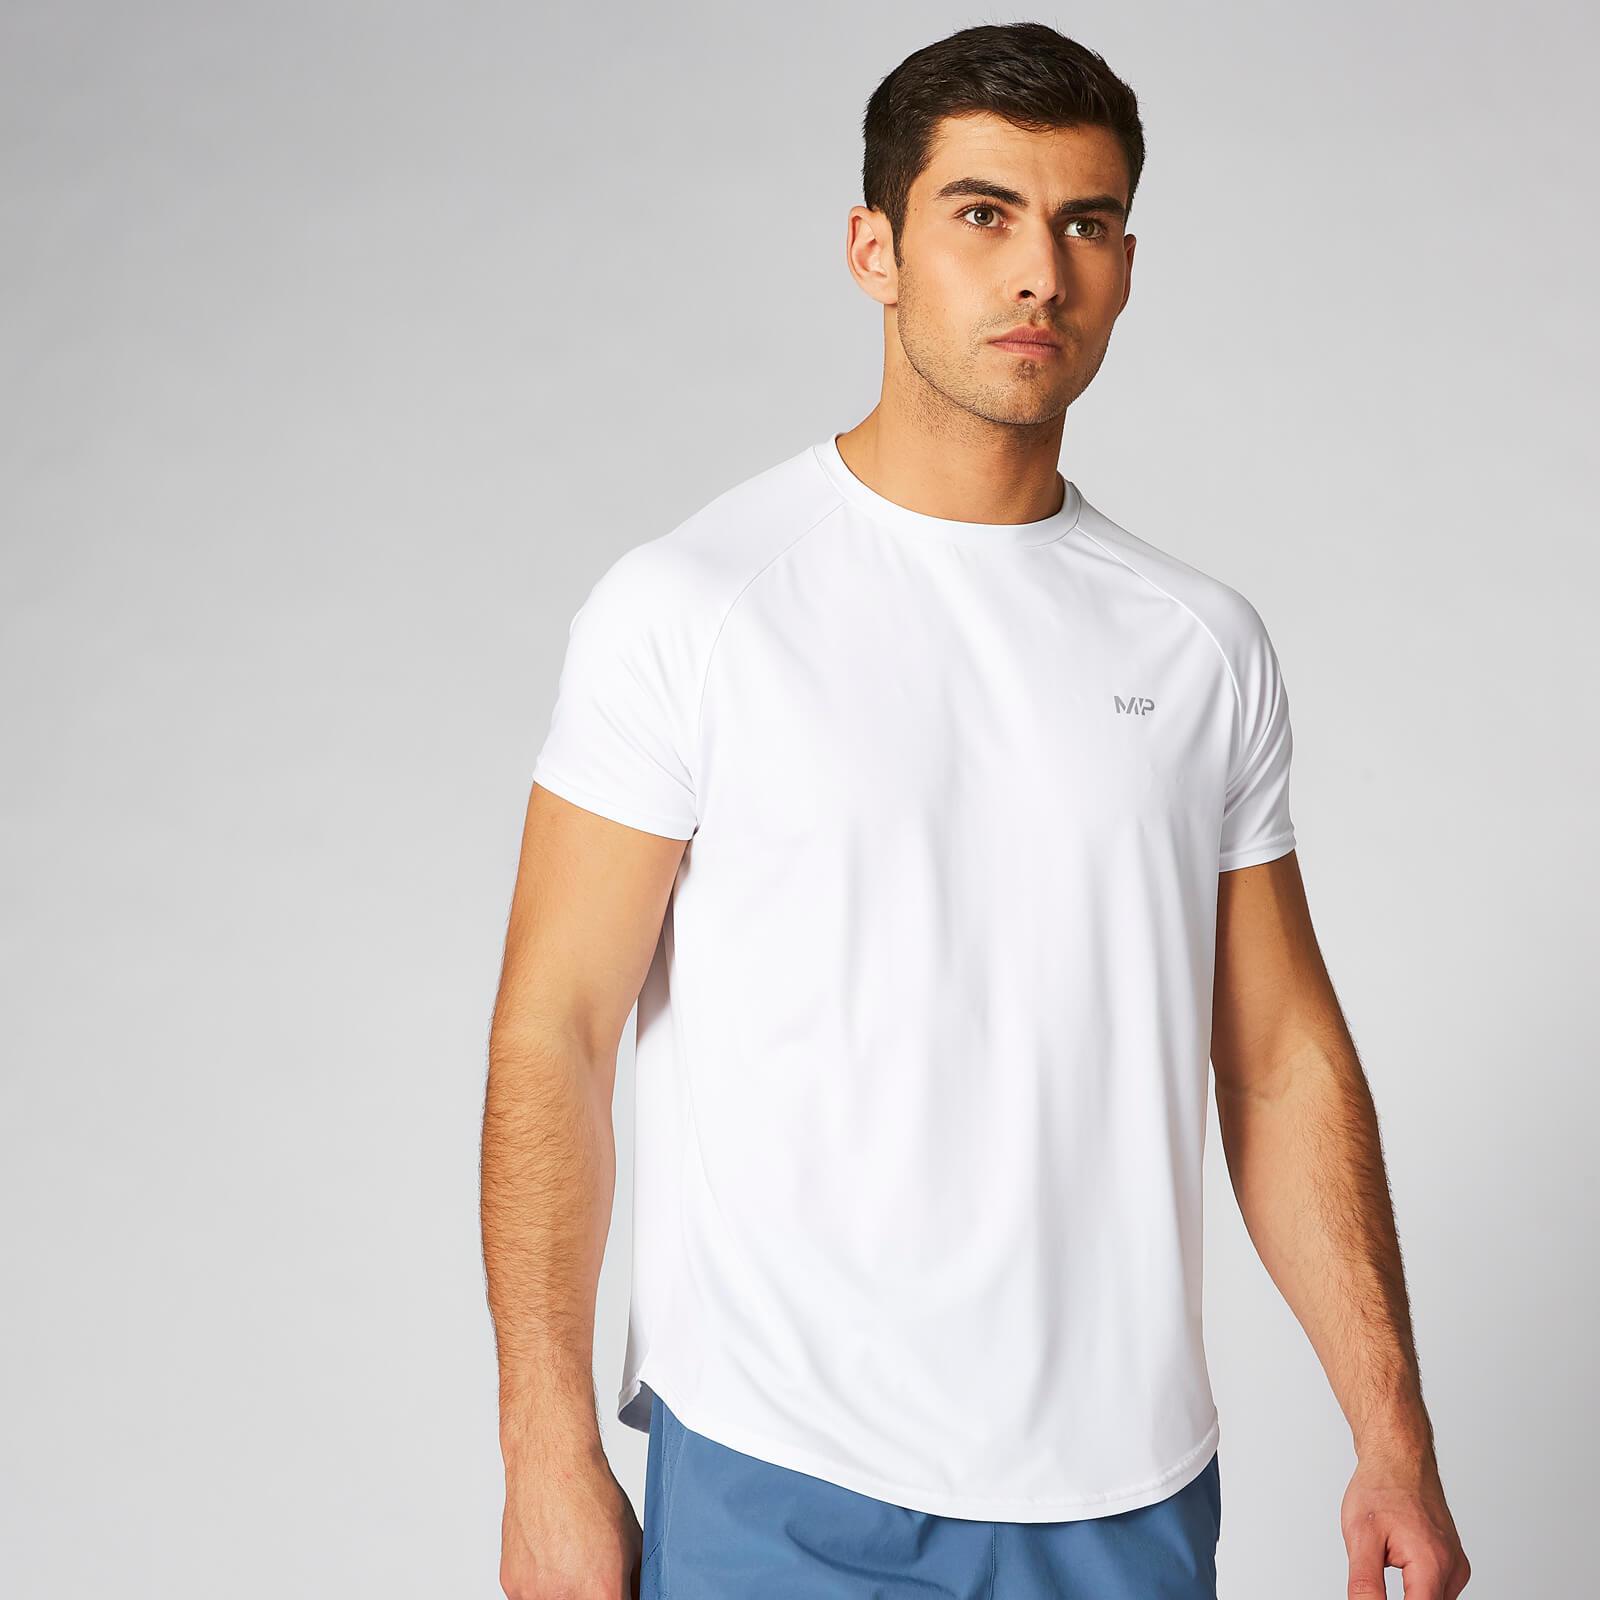 Myprotein Dry-Tech Infinity T-Shirt - White - XS